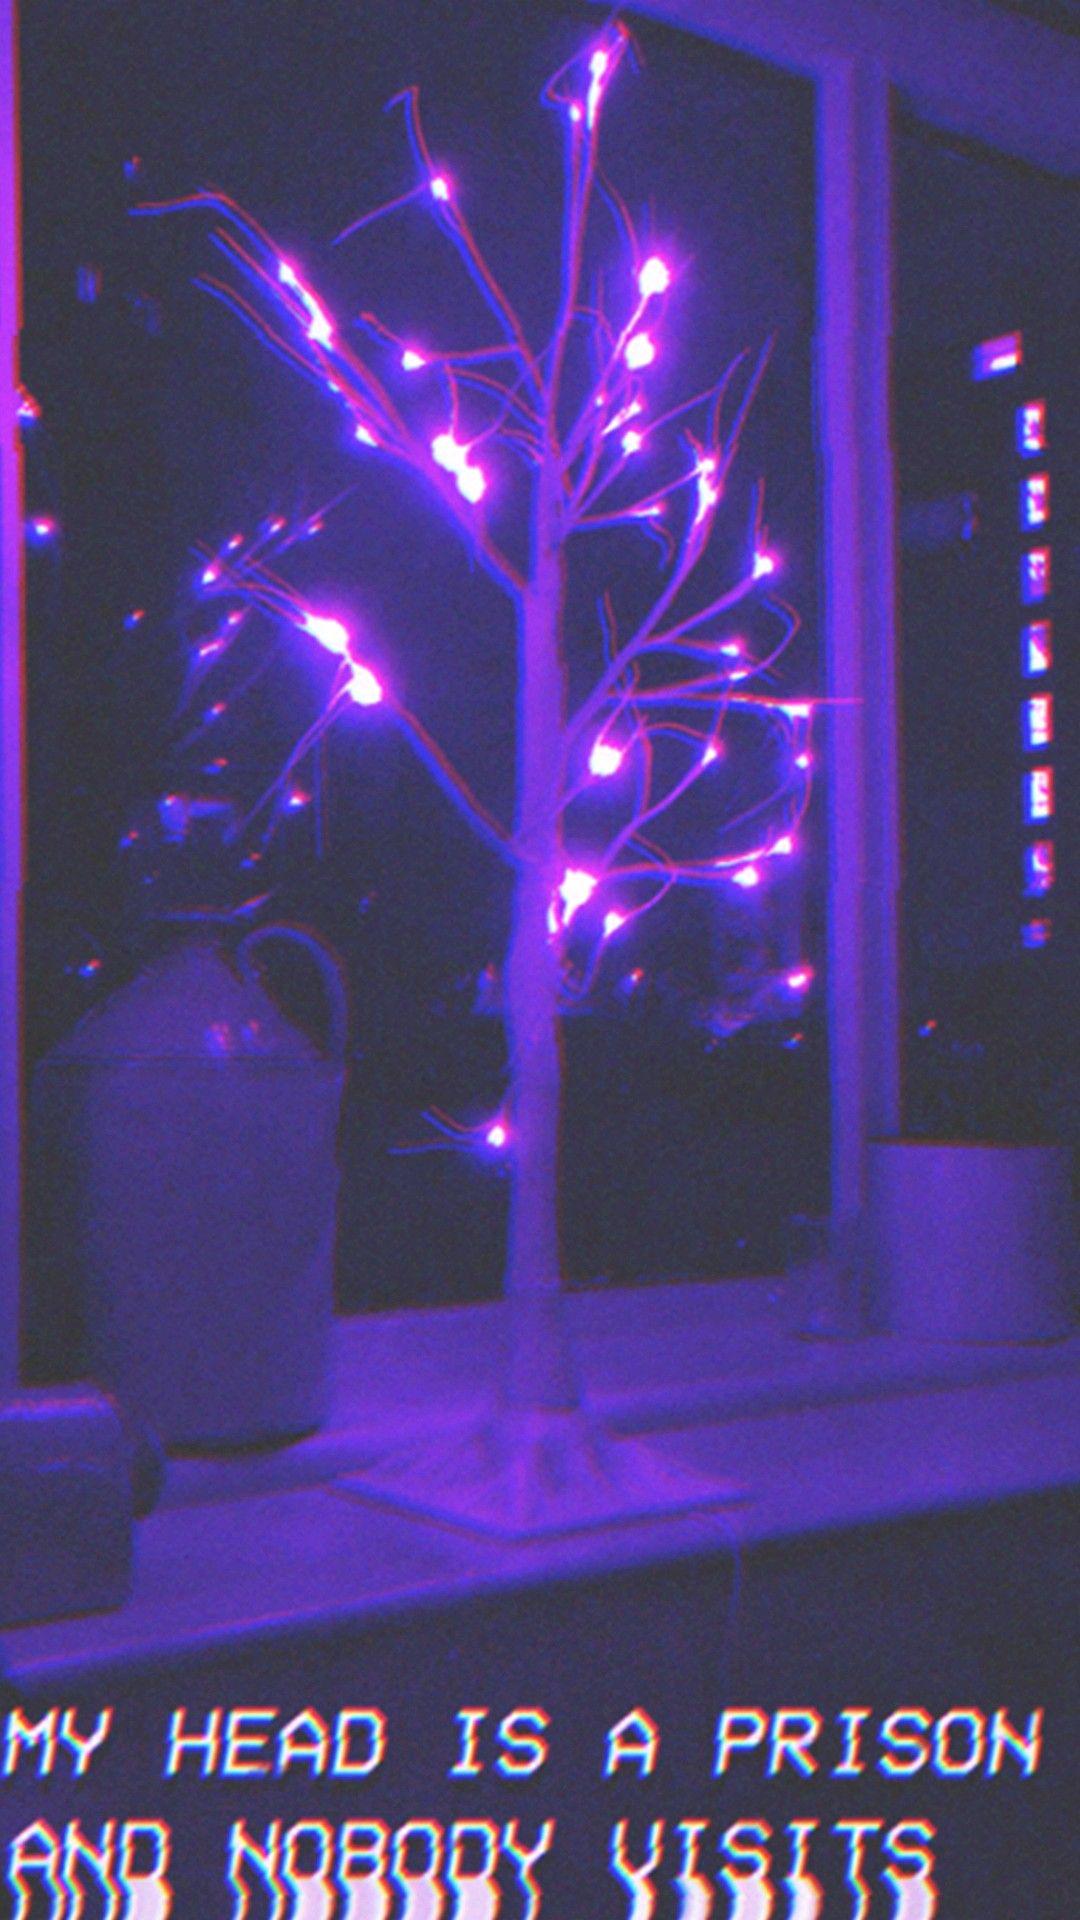 Idea by Lil Intro Vert on AESTHETIC Dark purple